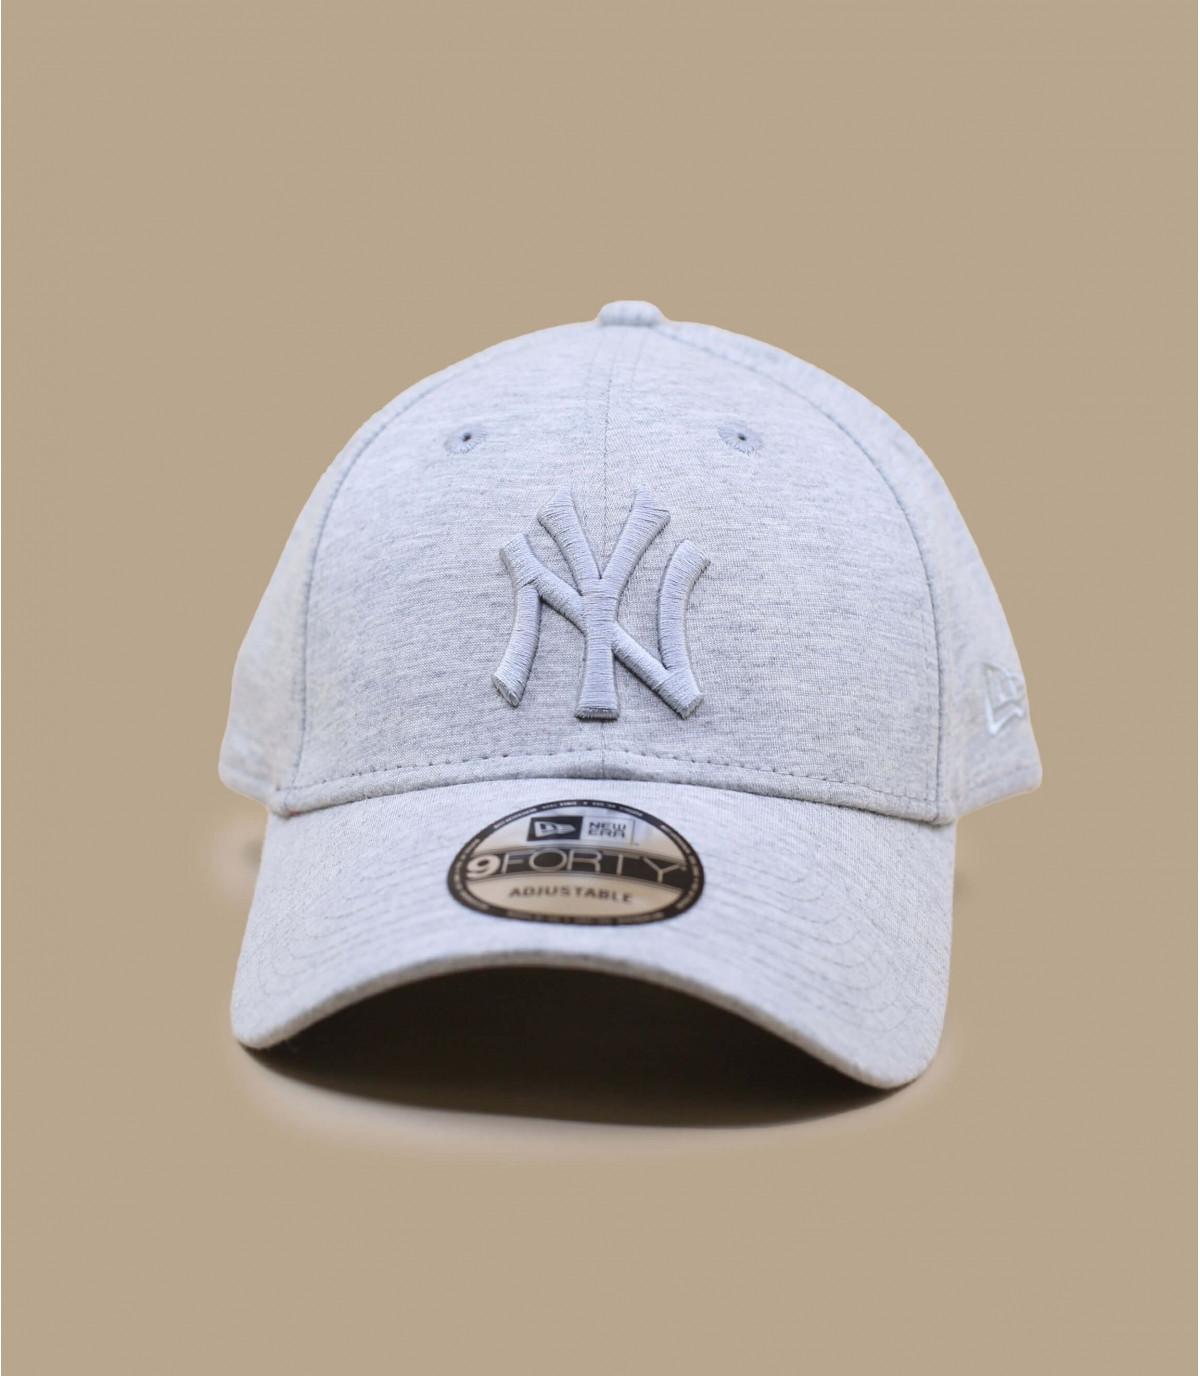 Details MLB Jersey NY gray - afbeeling 2